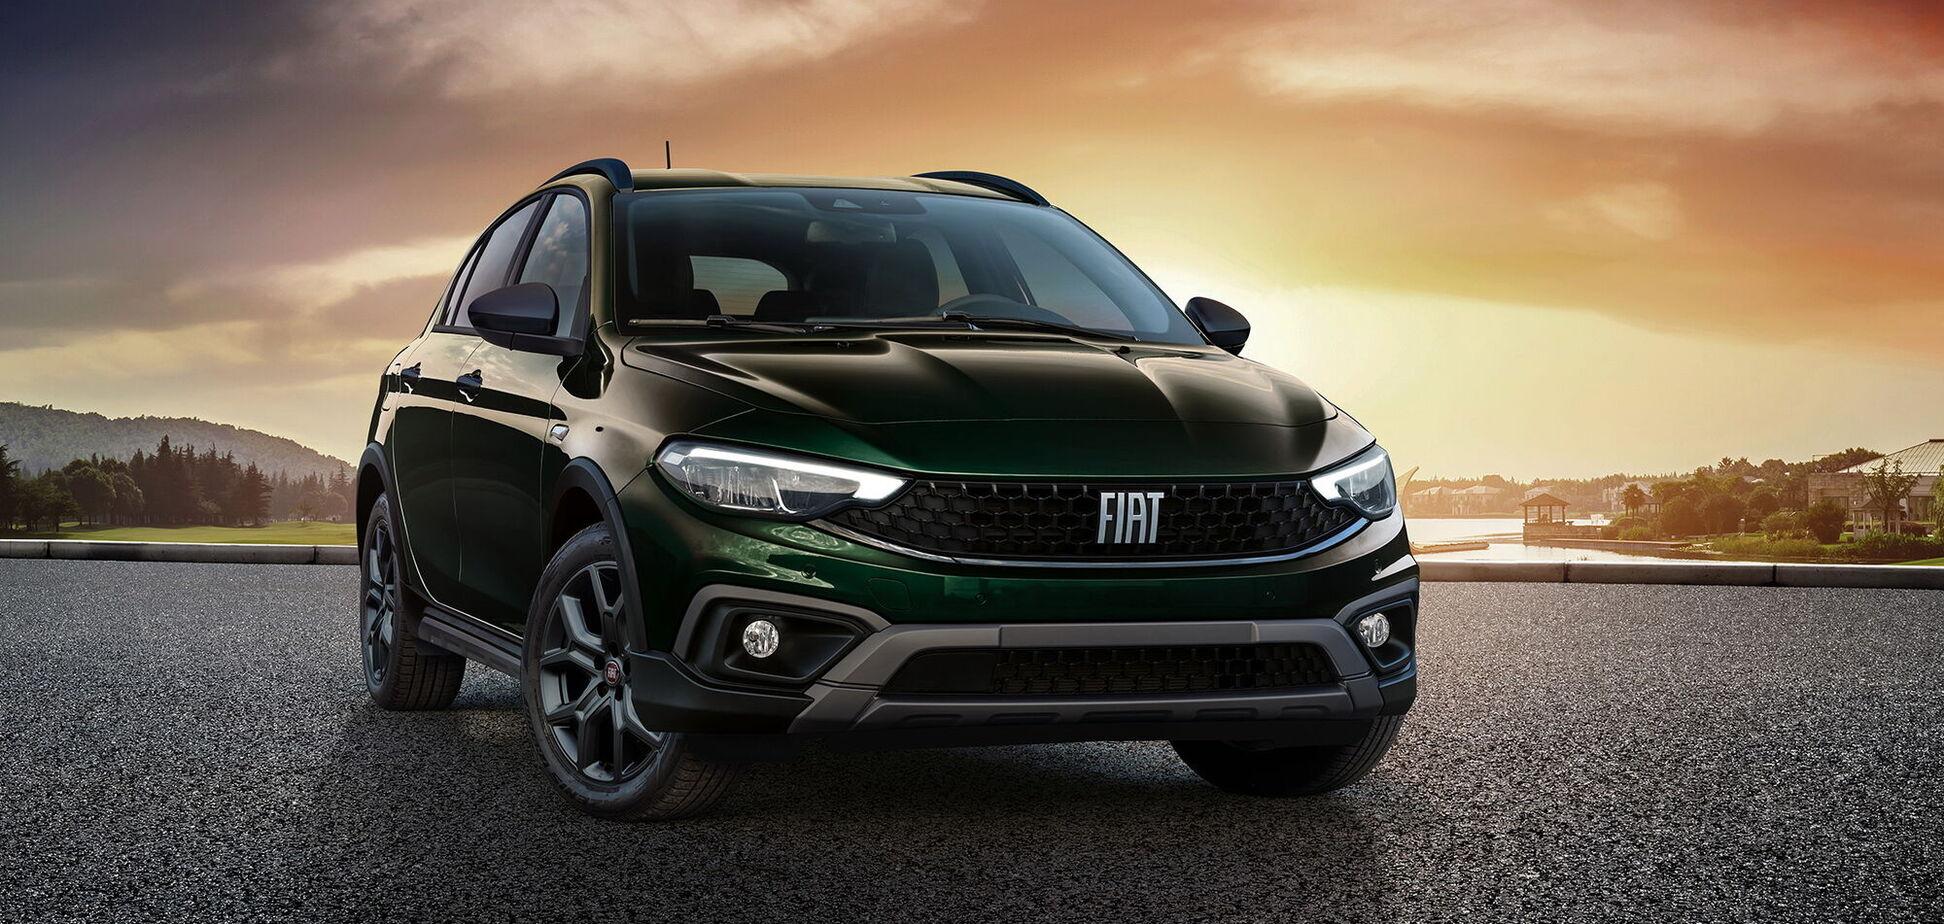 FIAT обновил модель Tipo и добавил новую версию Cross